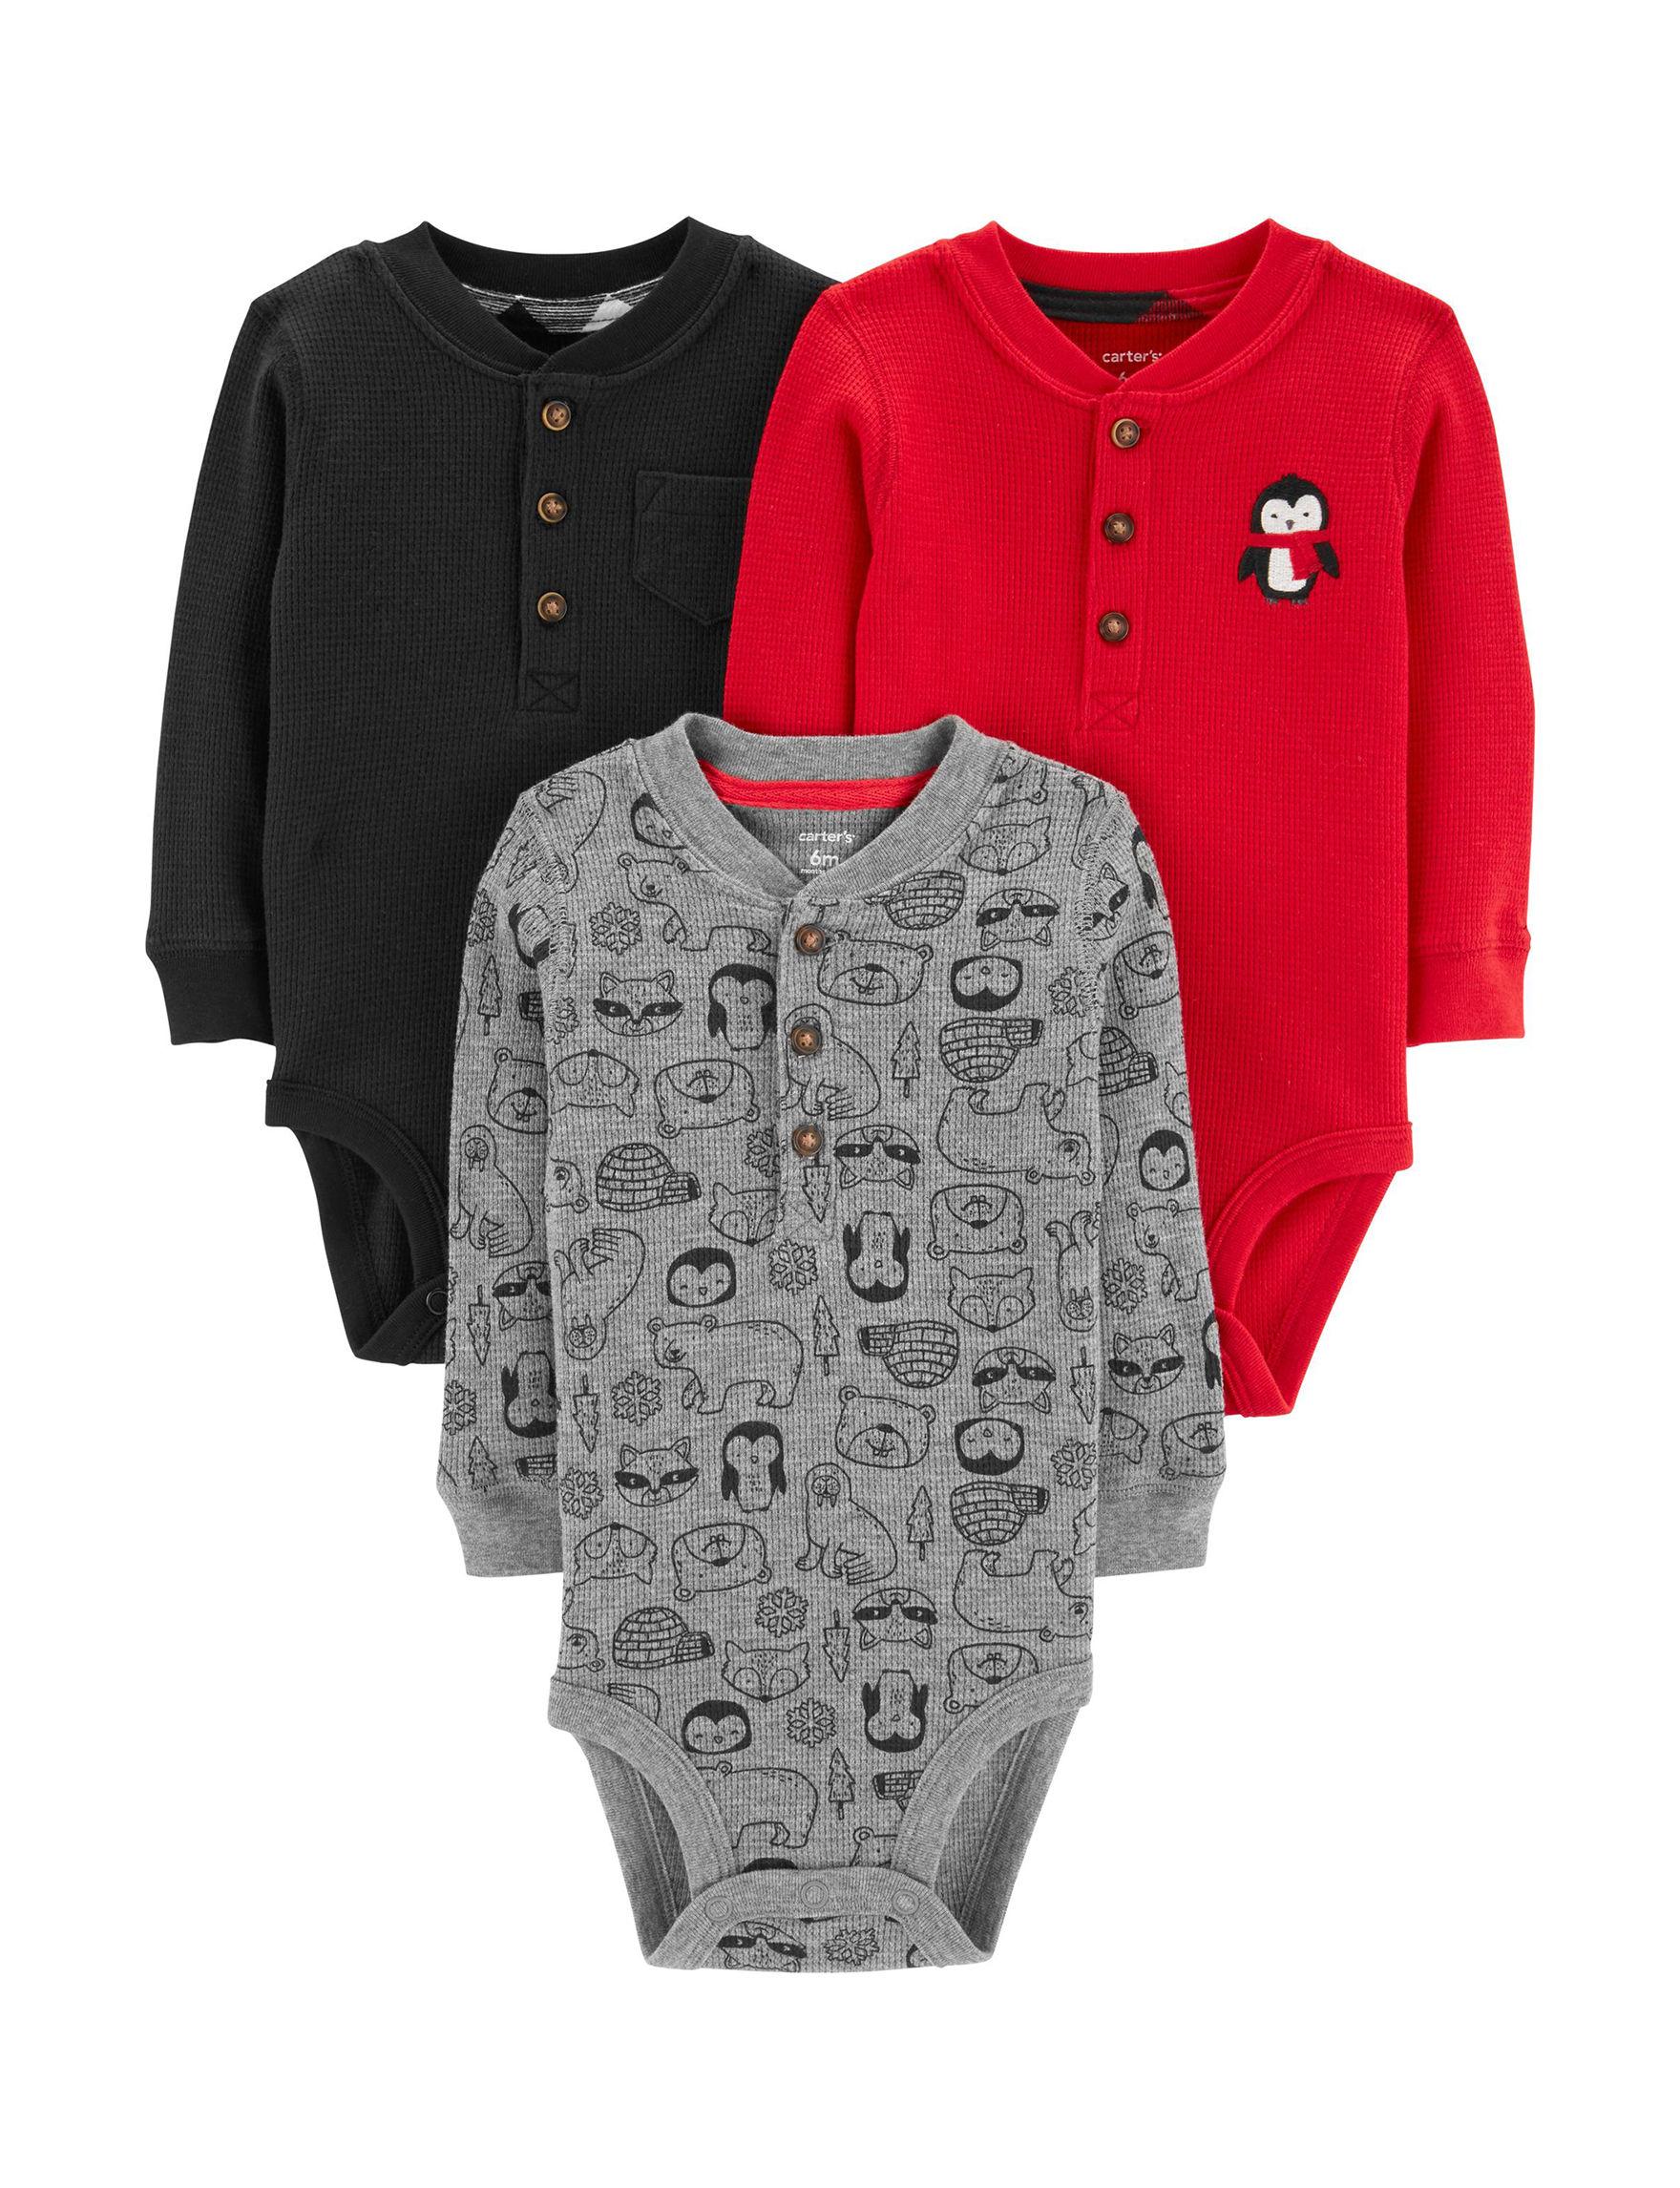 Carter's Black/Red/Grey